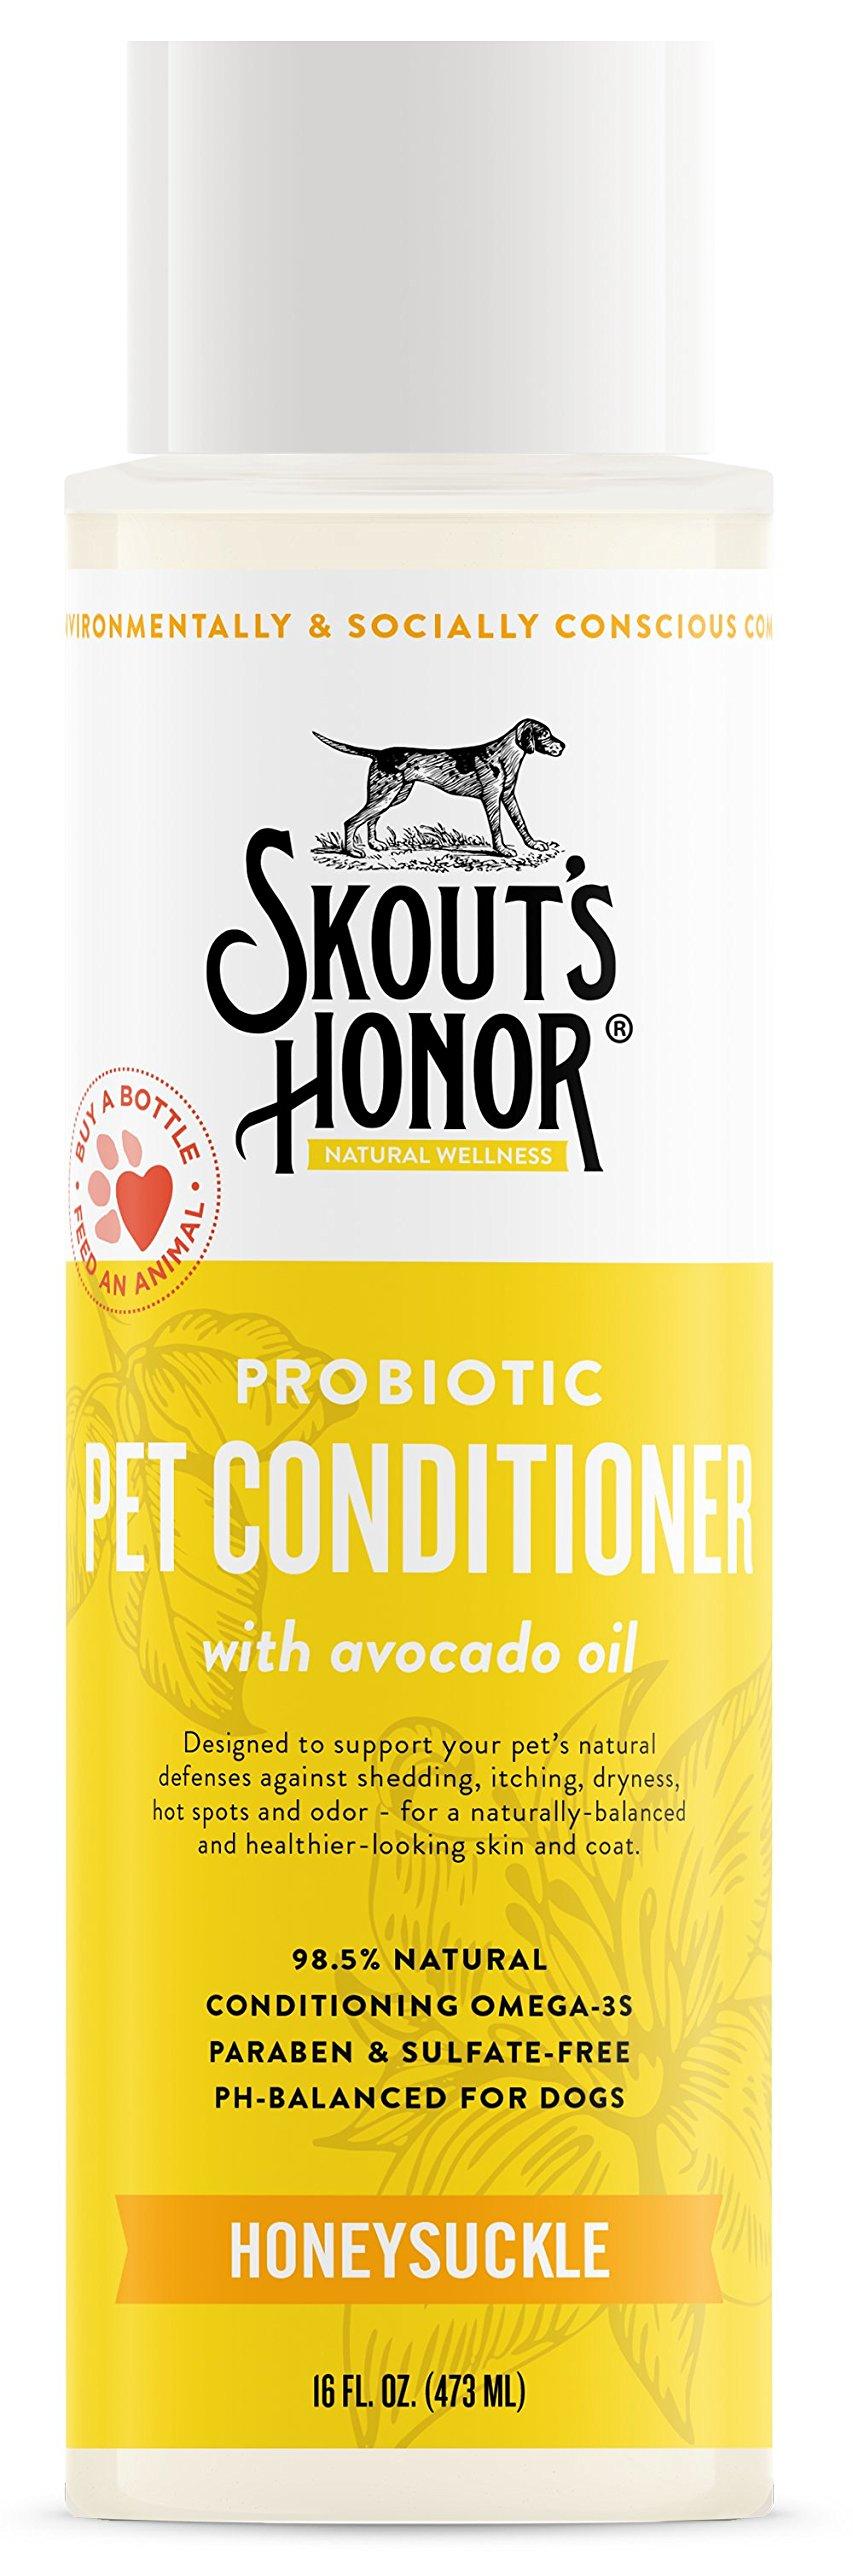 SKOUT'S HONOR Probiotic Pet Conditioner - 16 fl. oz.